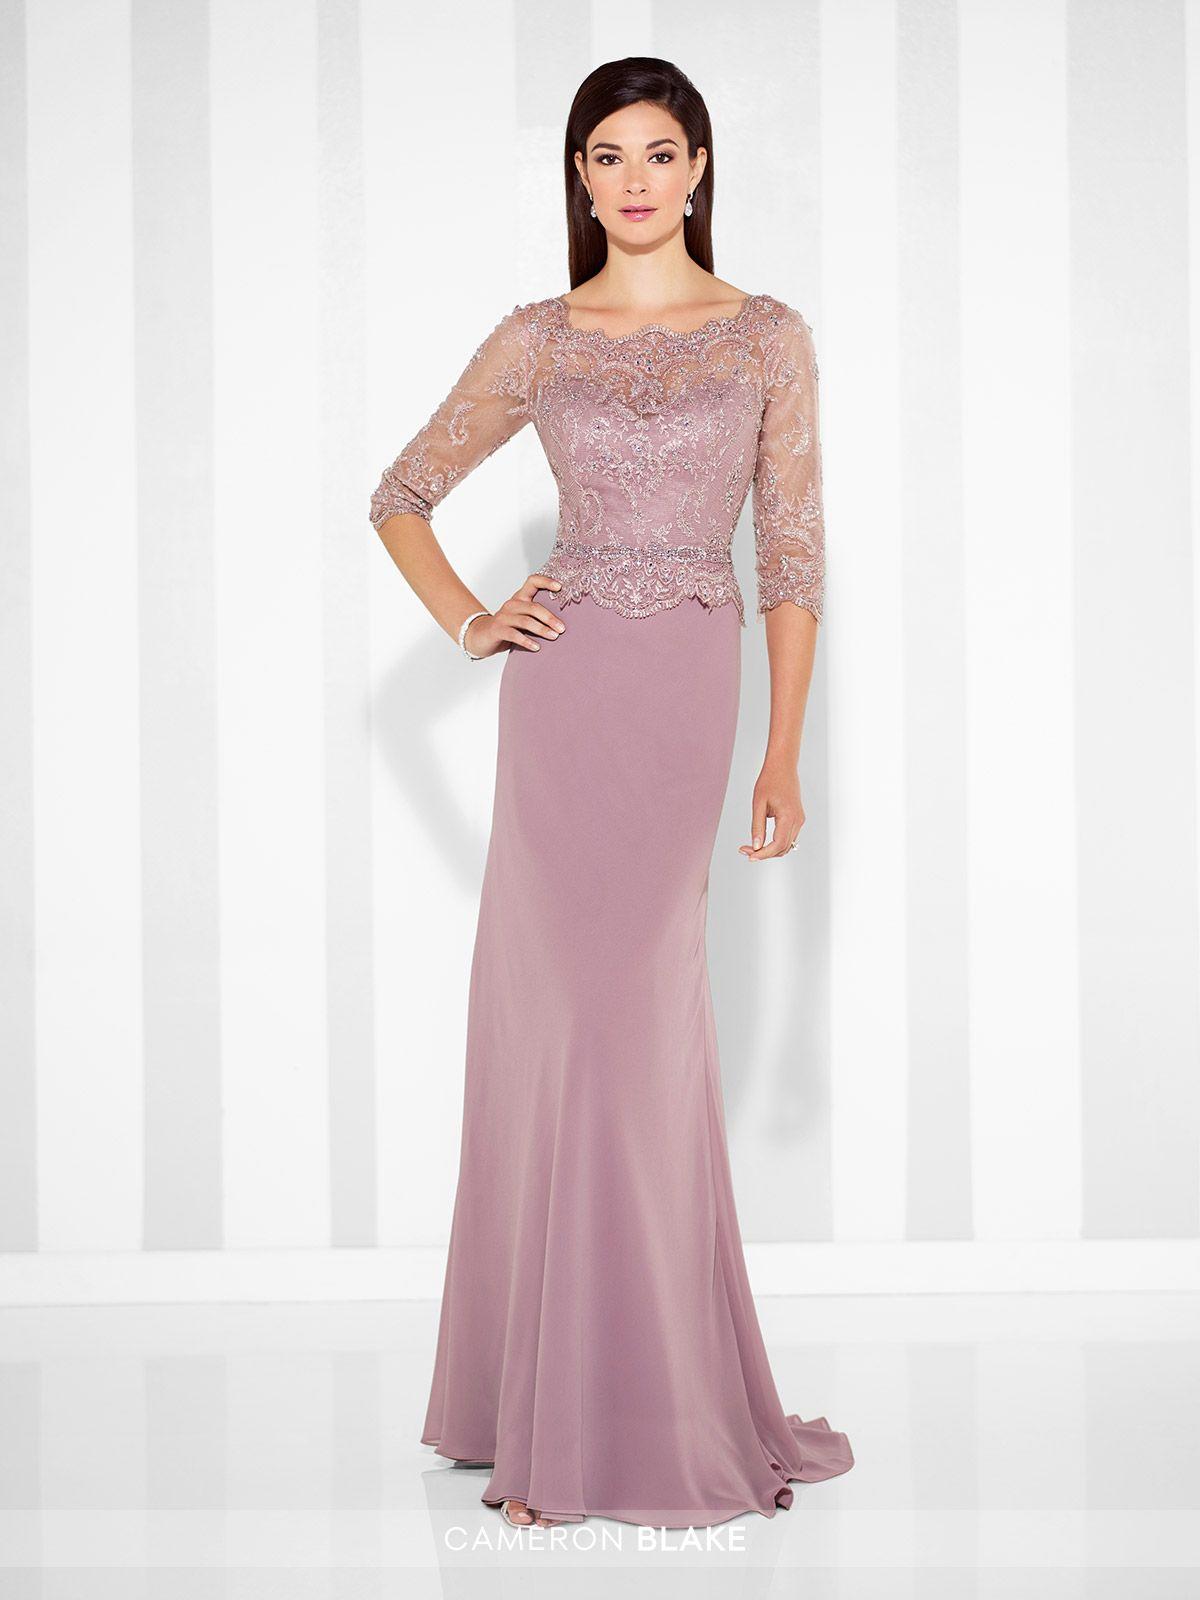 Cameron Blake - Evening Dresses - 117617 | Vestidos invitada, Noche ...